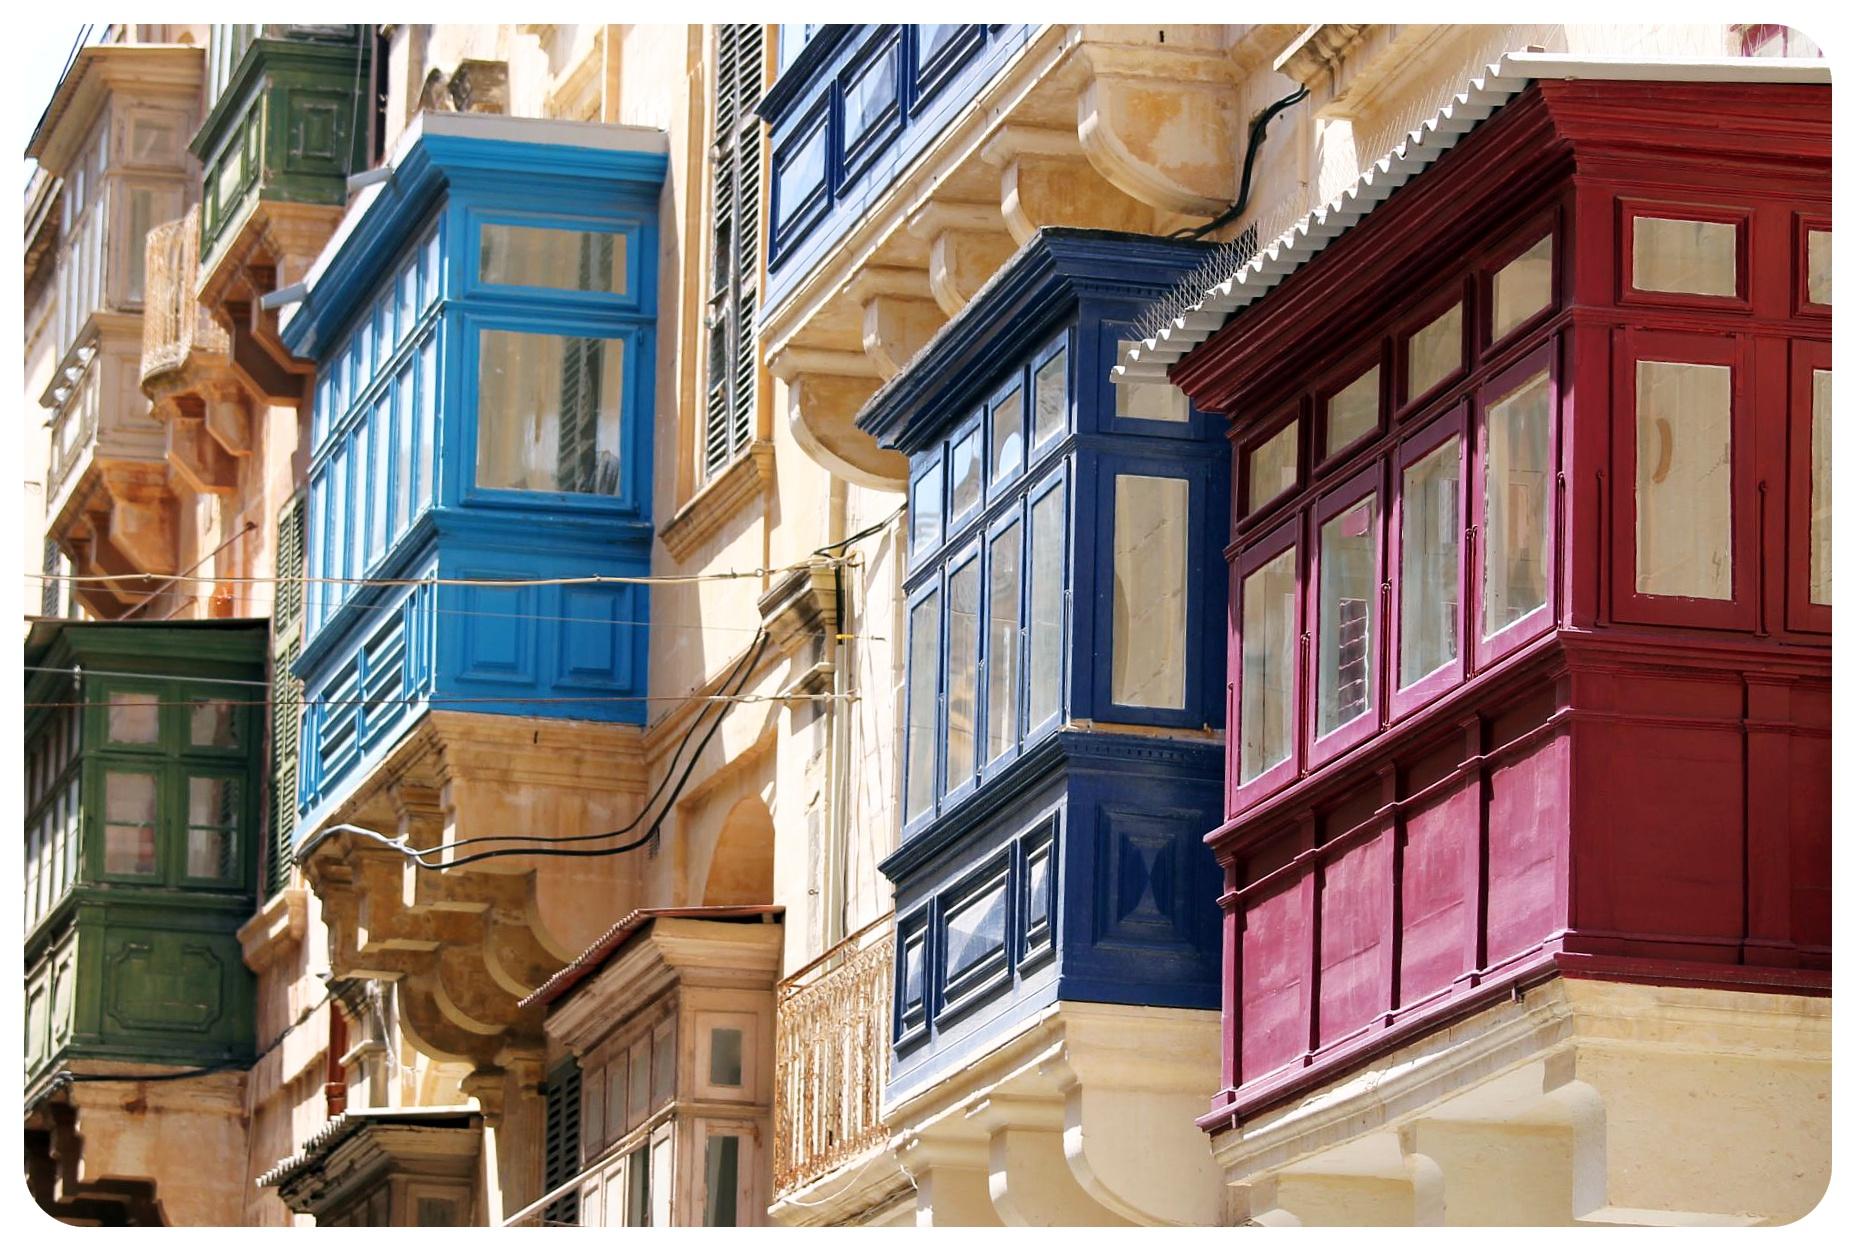 valletta colorful balconies